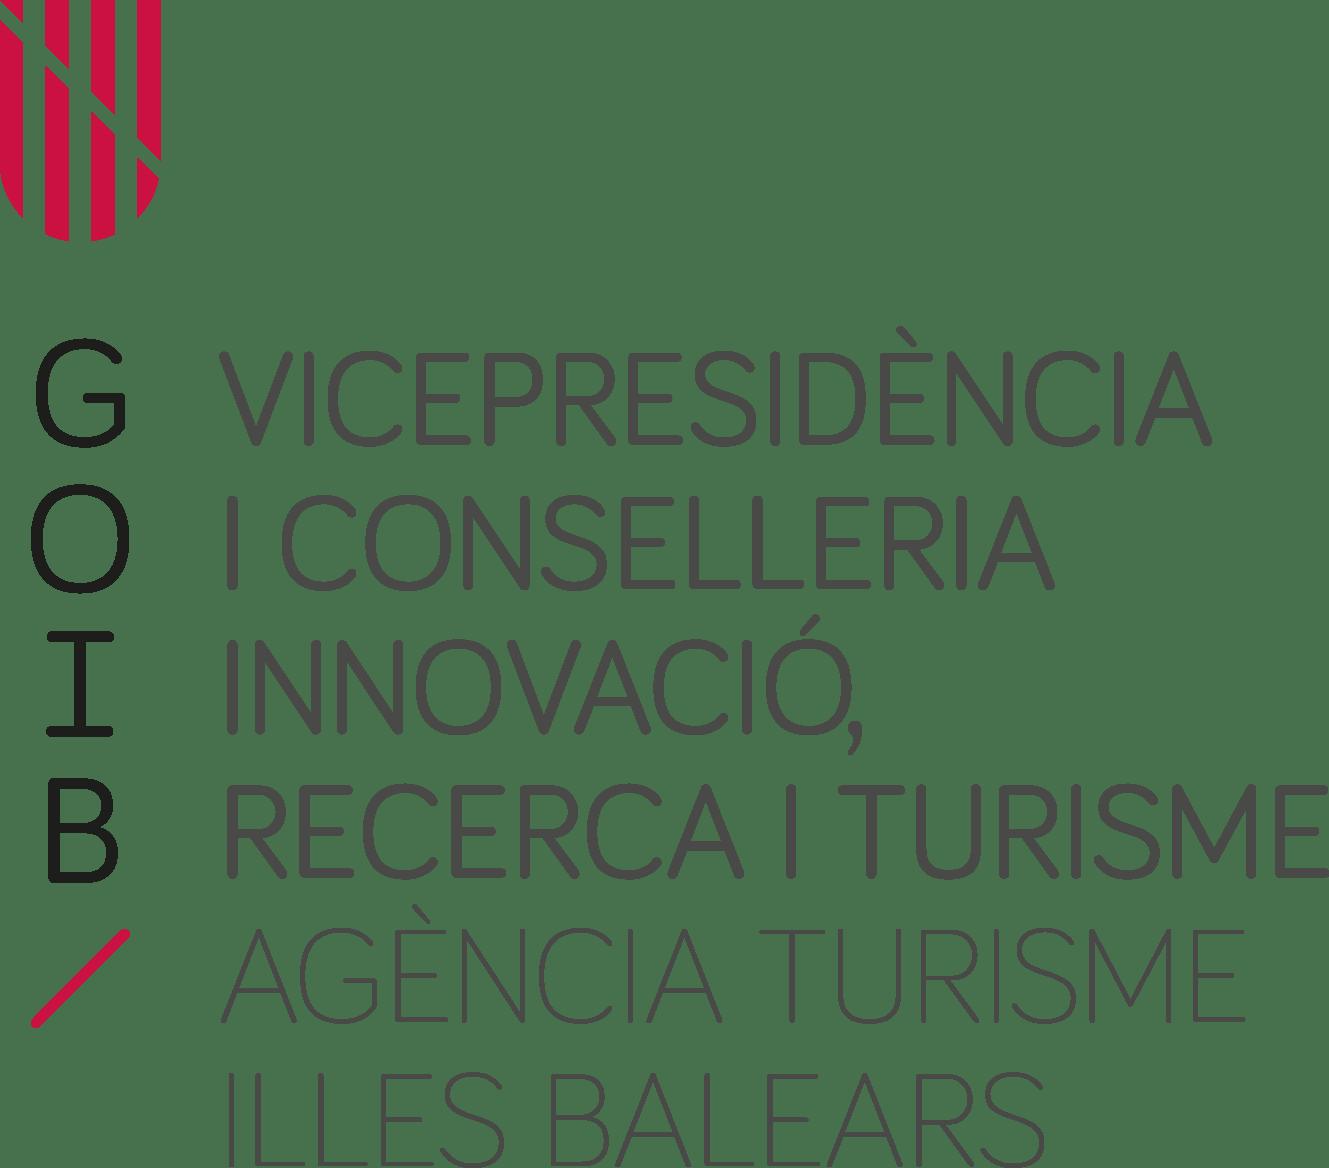 ¡VAMOS! Español en España FEDELE Workshop 2017 1